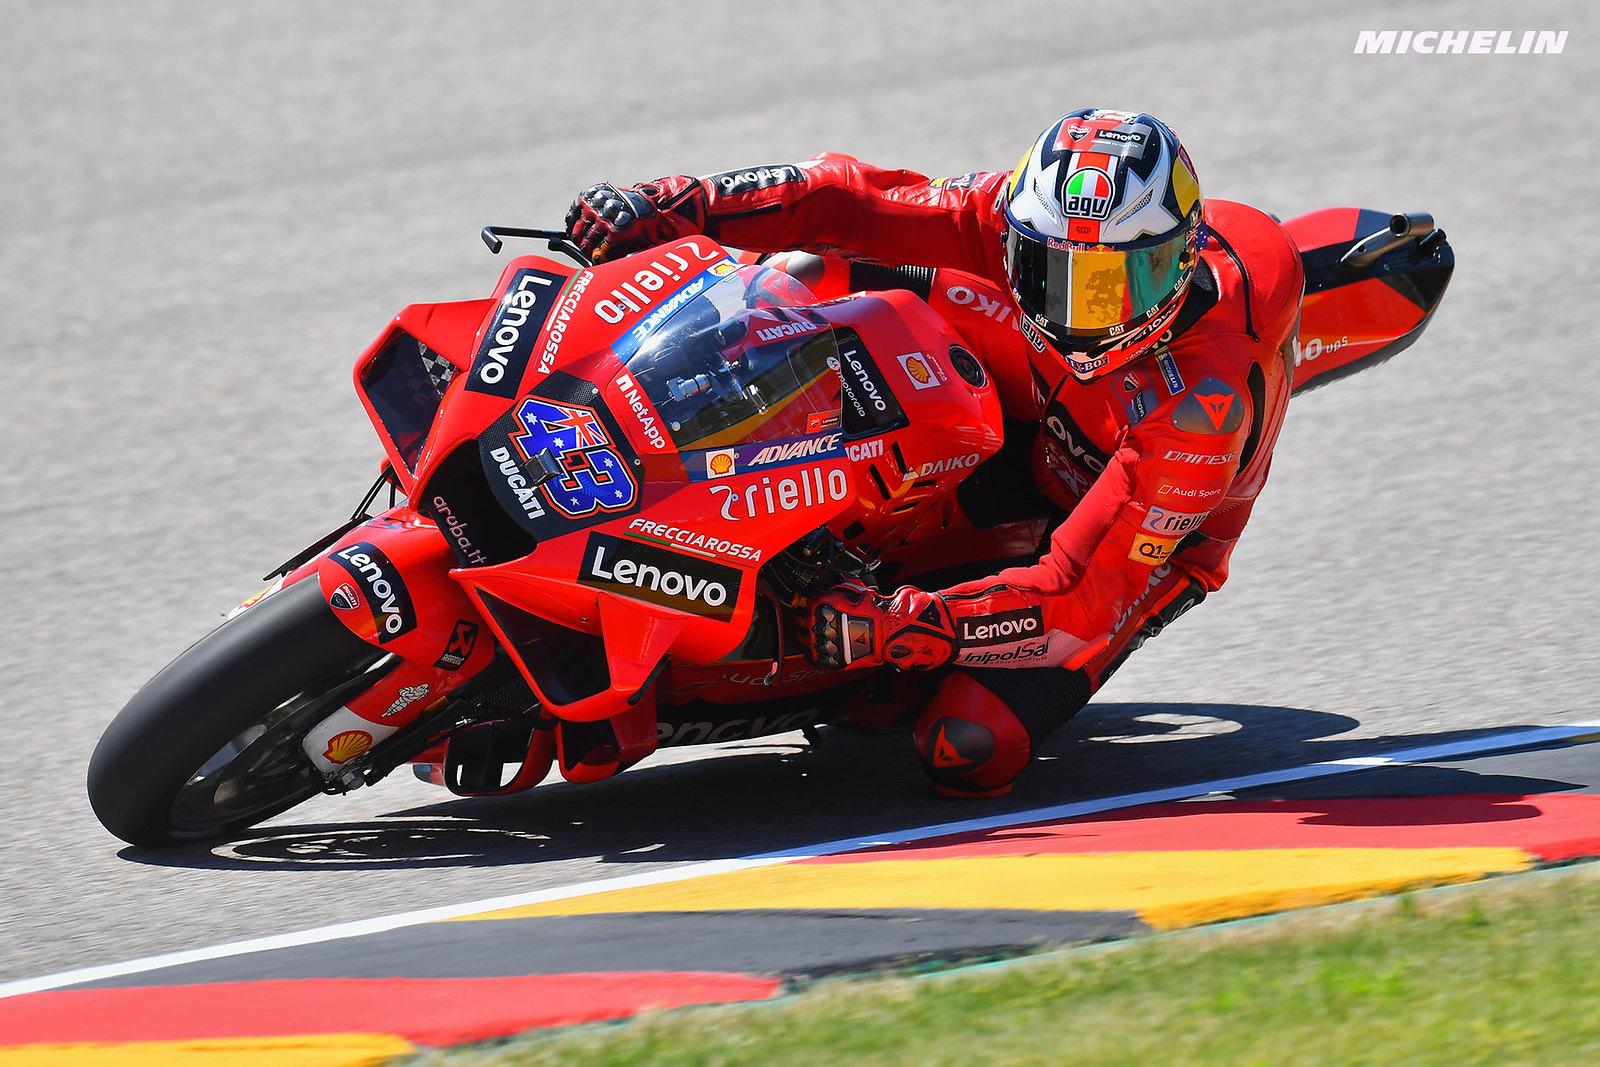 MotoGP2021 ドイツGP 初日総合9位 ジャック・ミラー「セクター3で苦戦中」